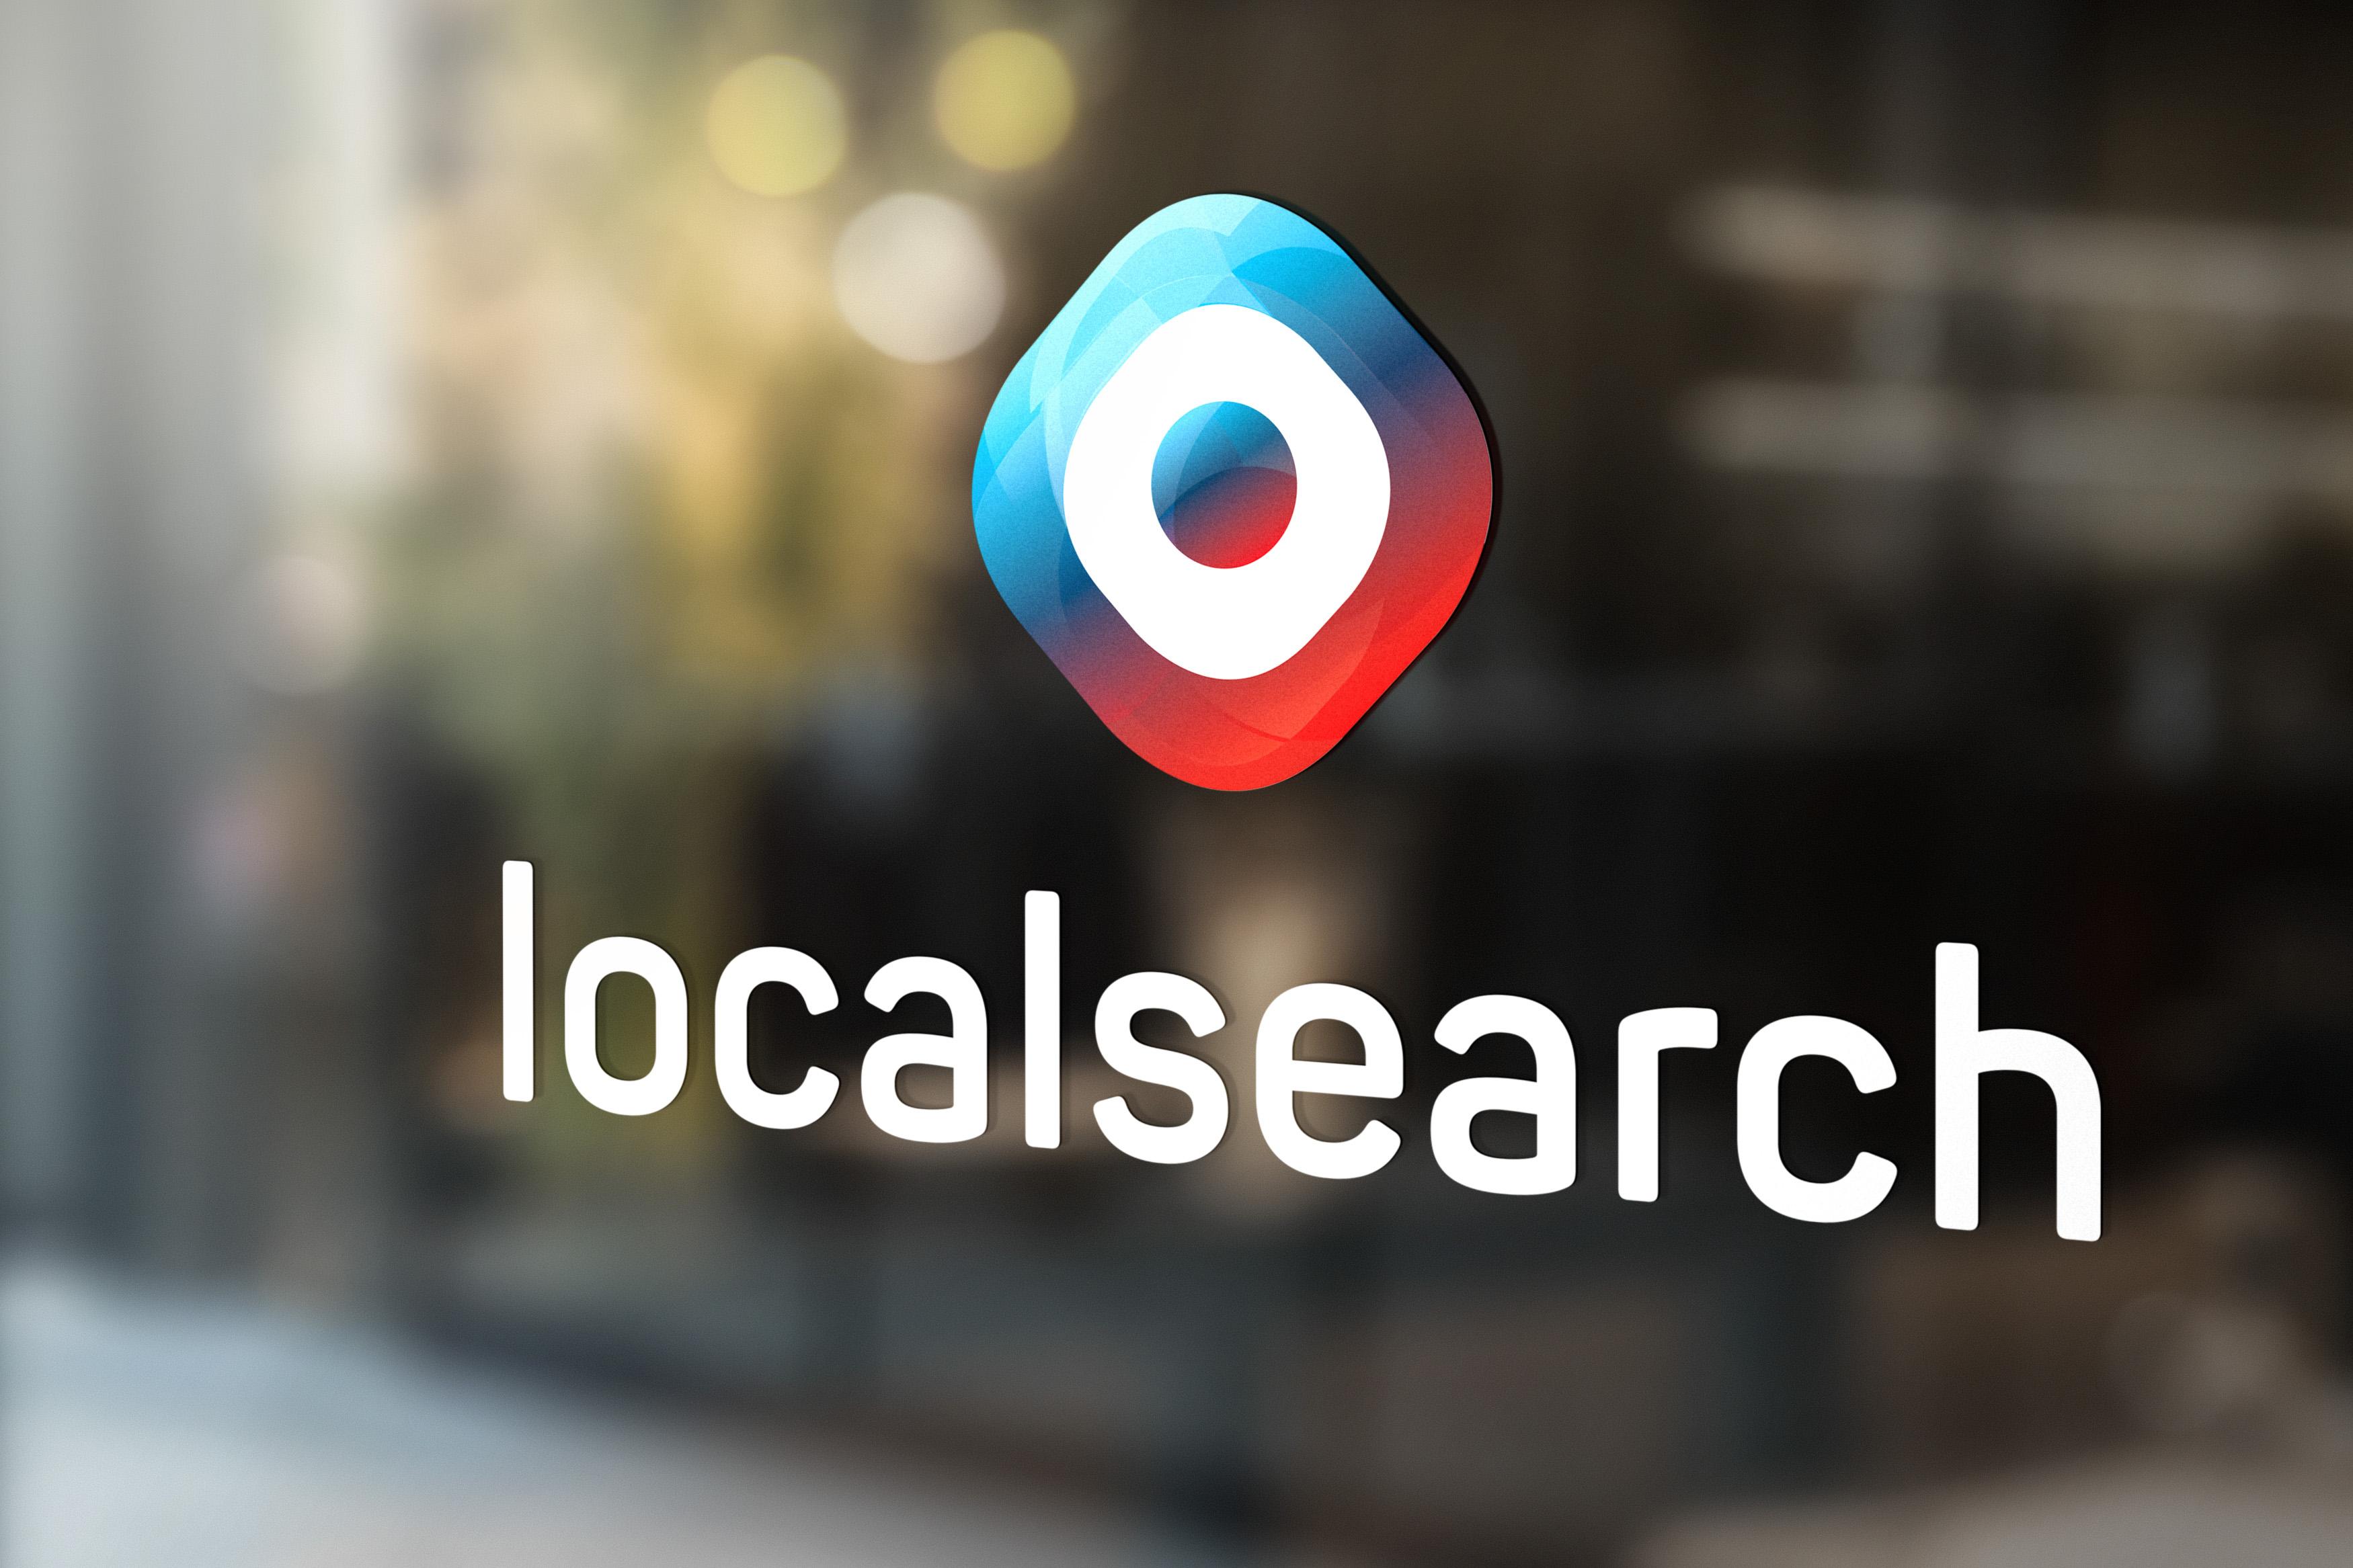 localsearch logo 2